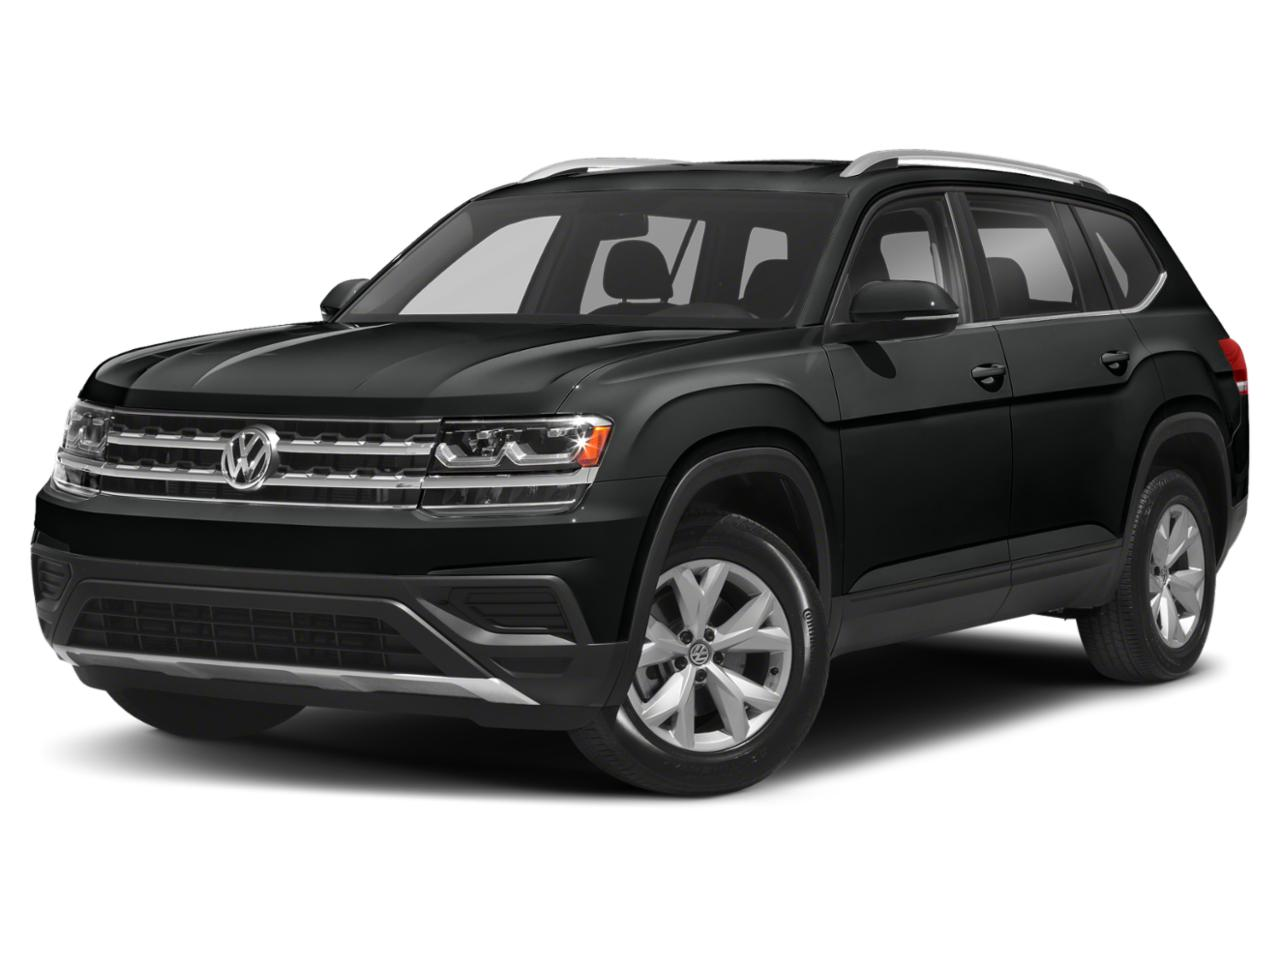 2018 Volkswagen Atlas Vehicle Photo in San Antonio, TX 78257